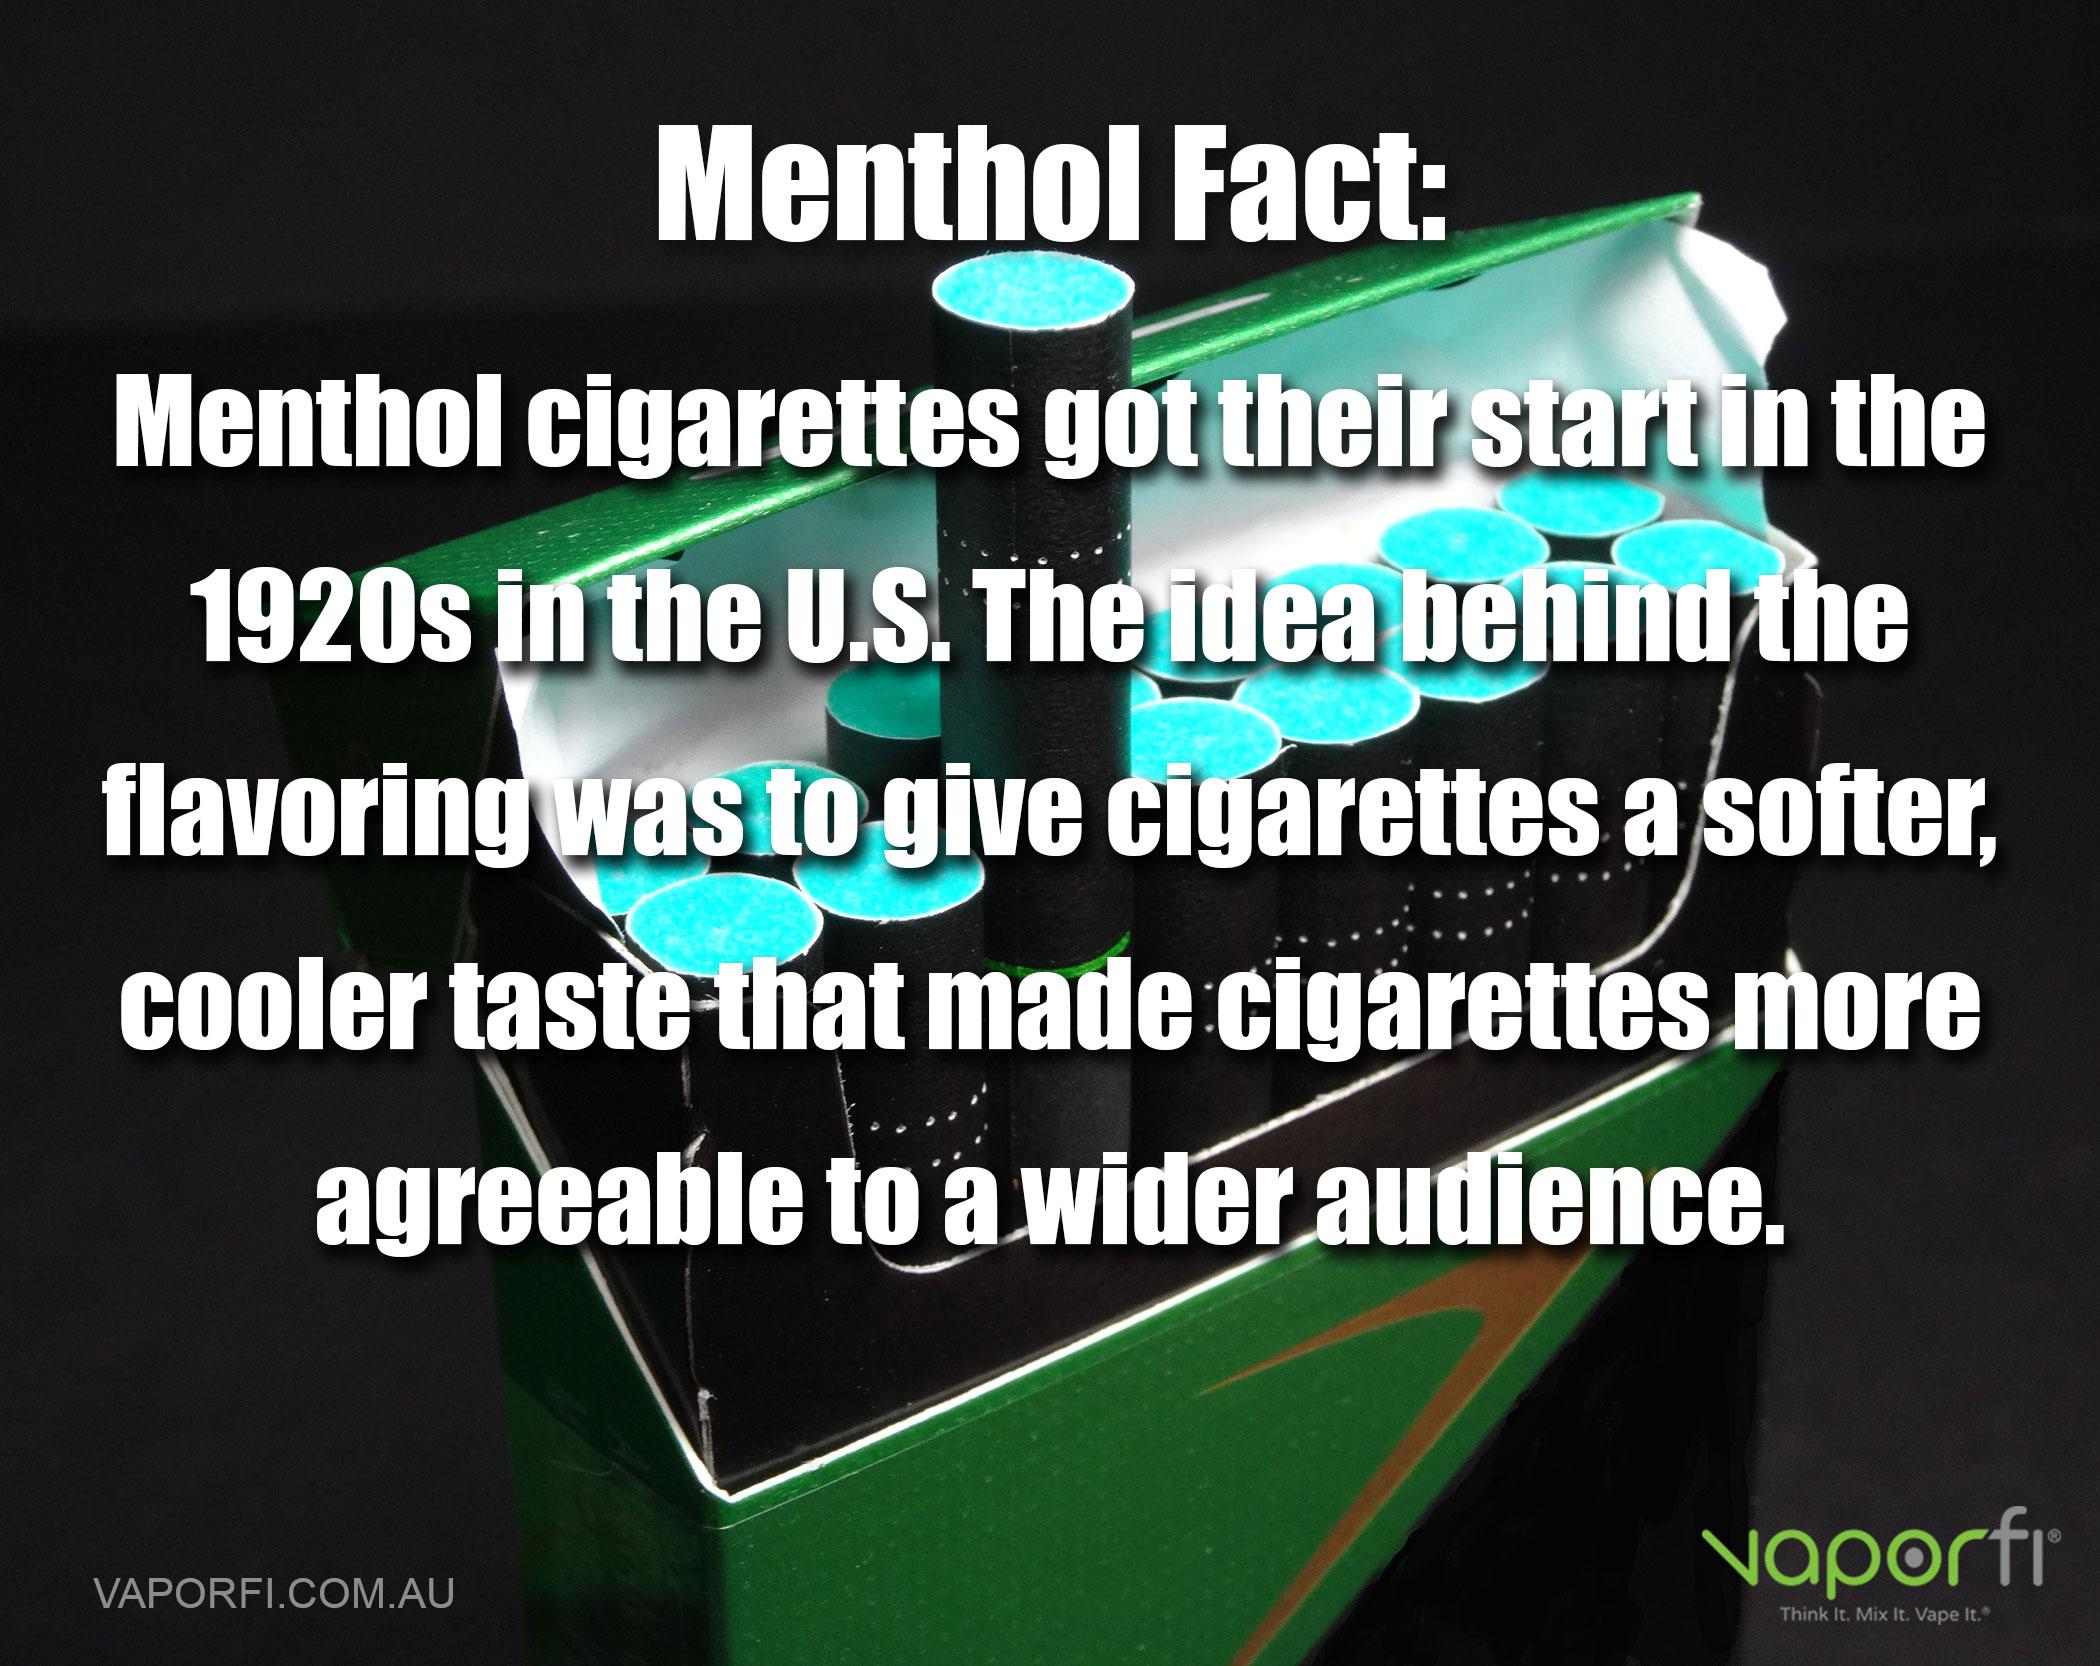 VaporFi AU - ECig for Menthol Lovers: Menthol Fact